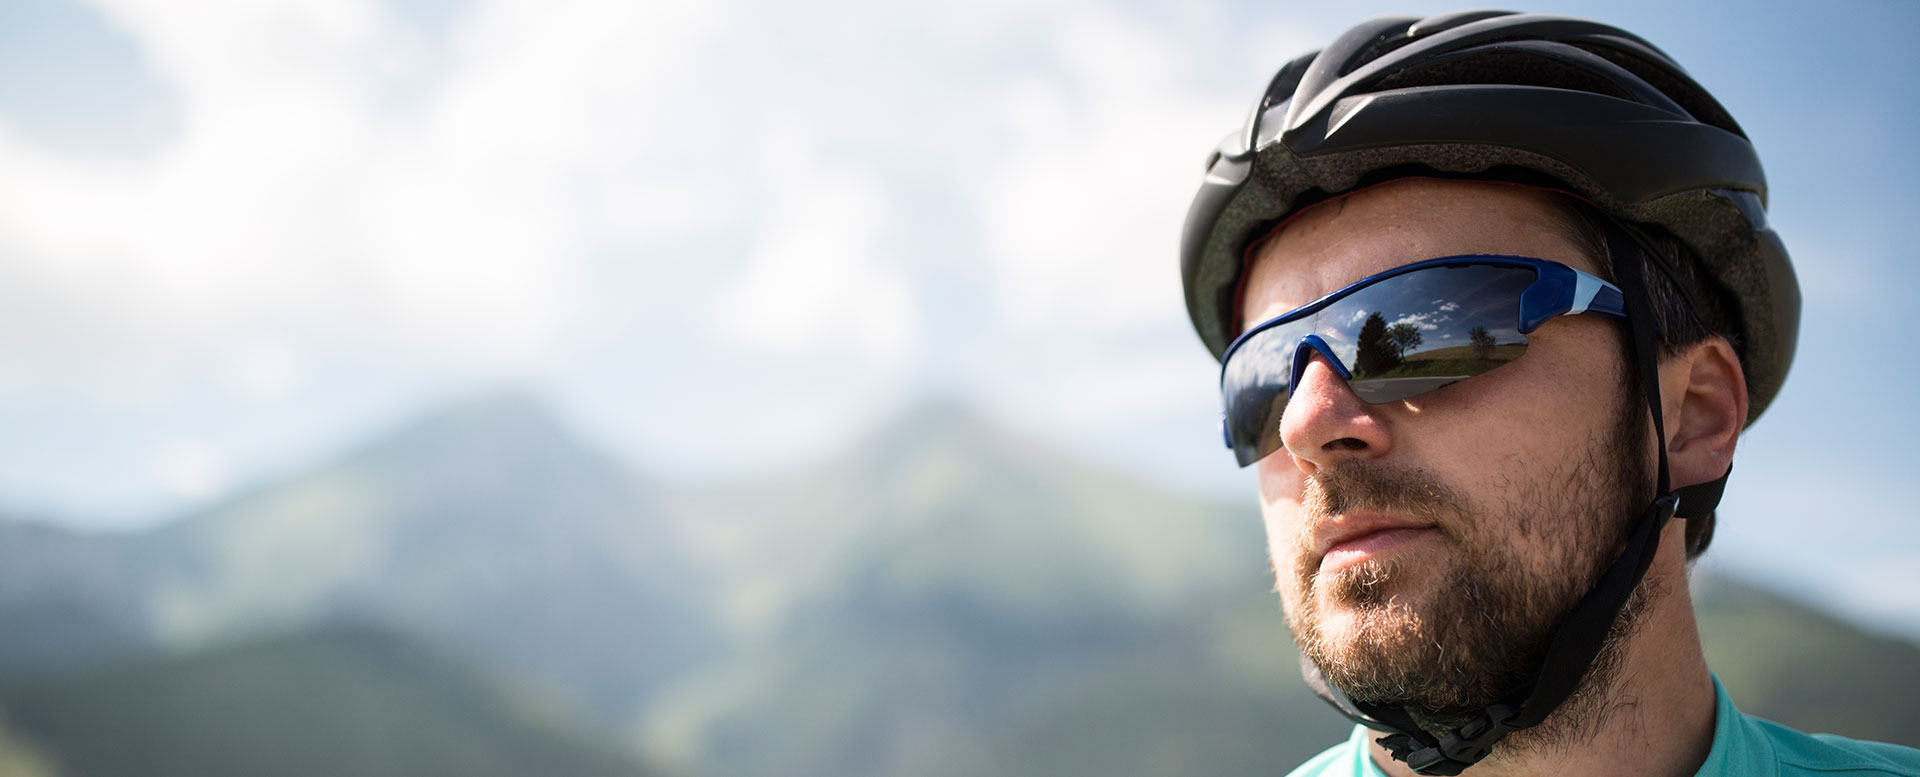 Fahrradhelme müssen richtig passen